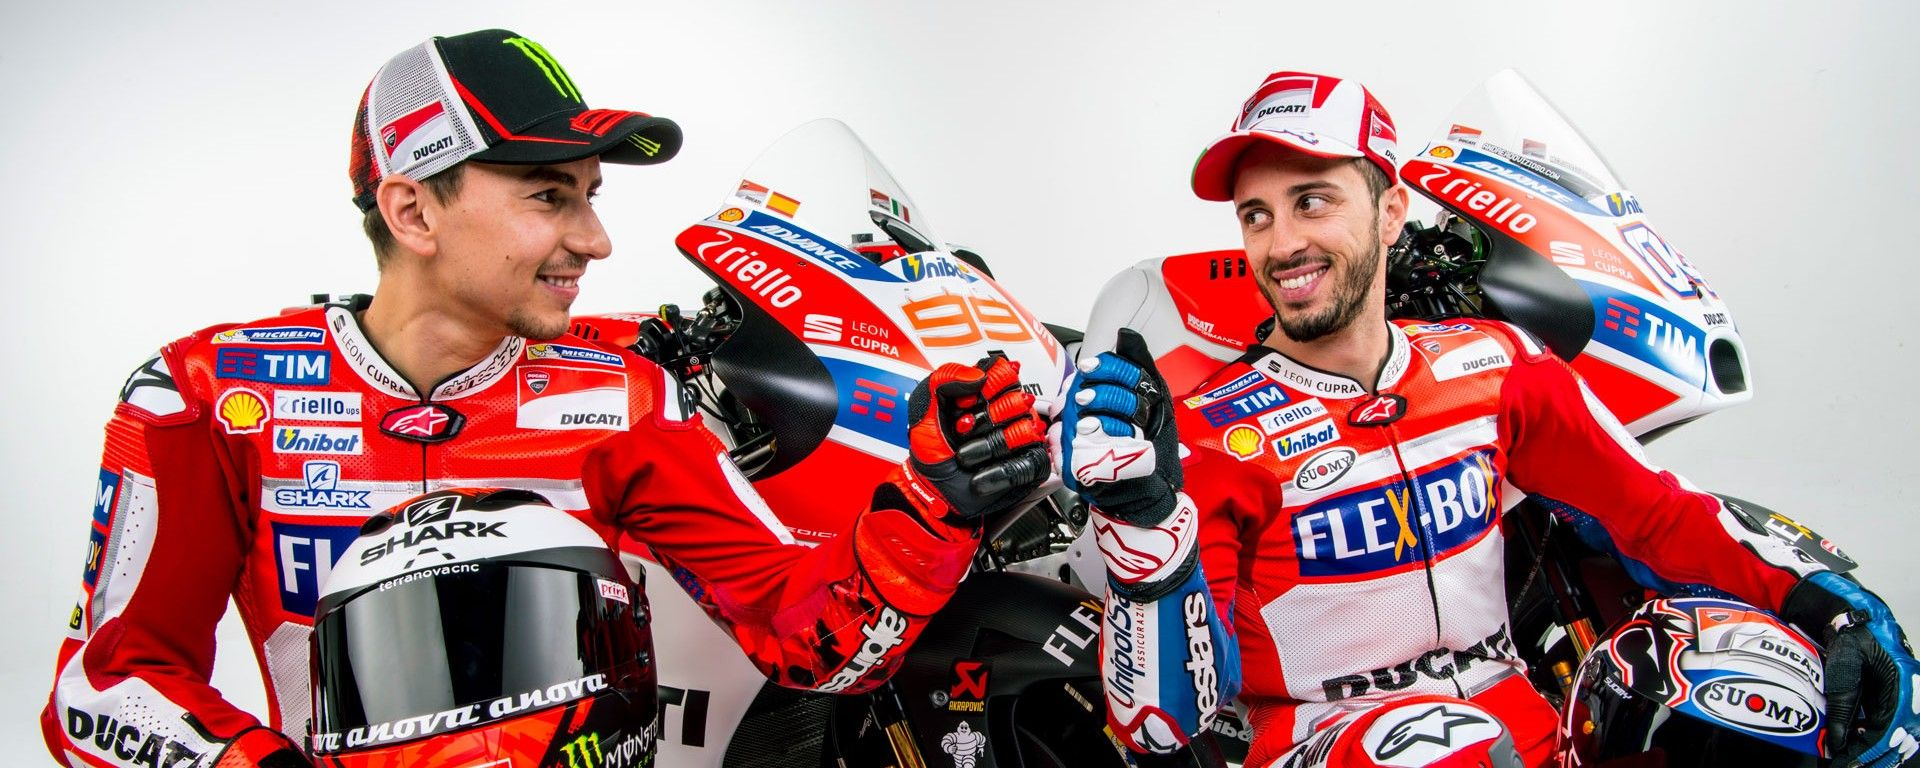 Presentazione Ducati MotoGP